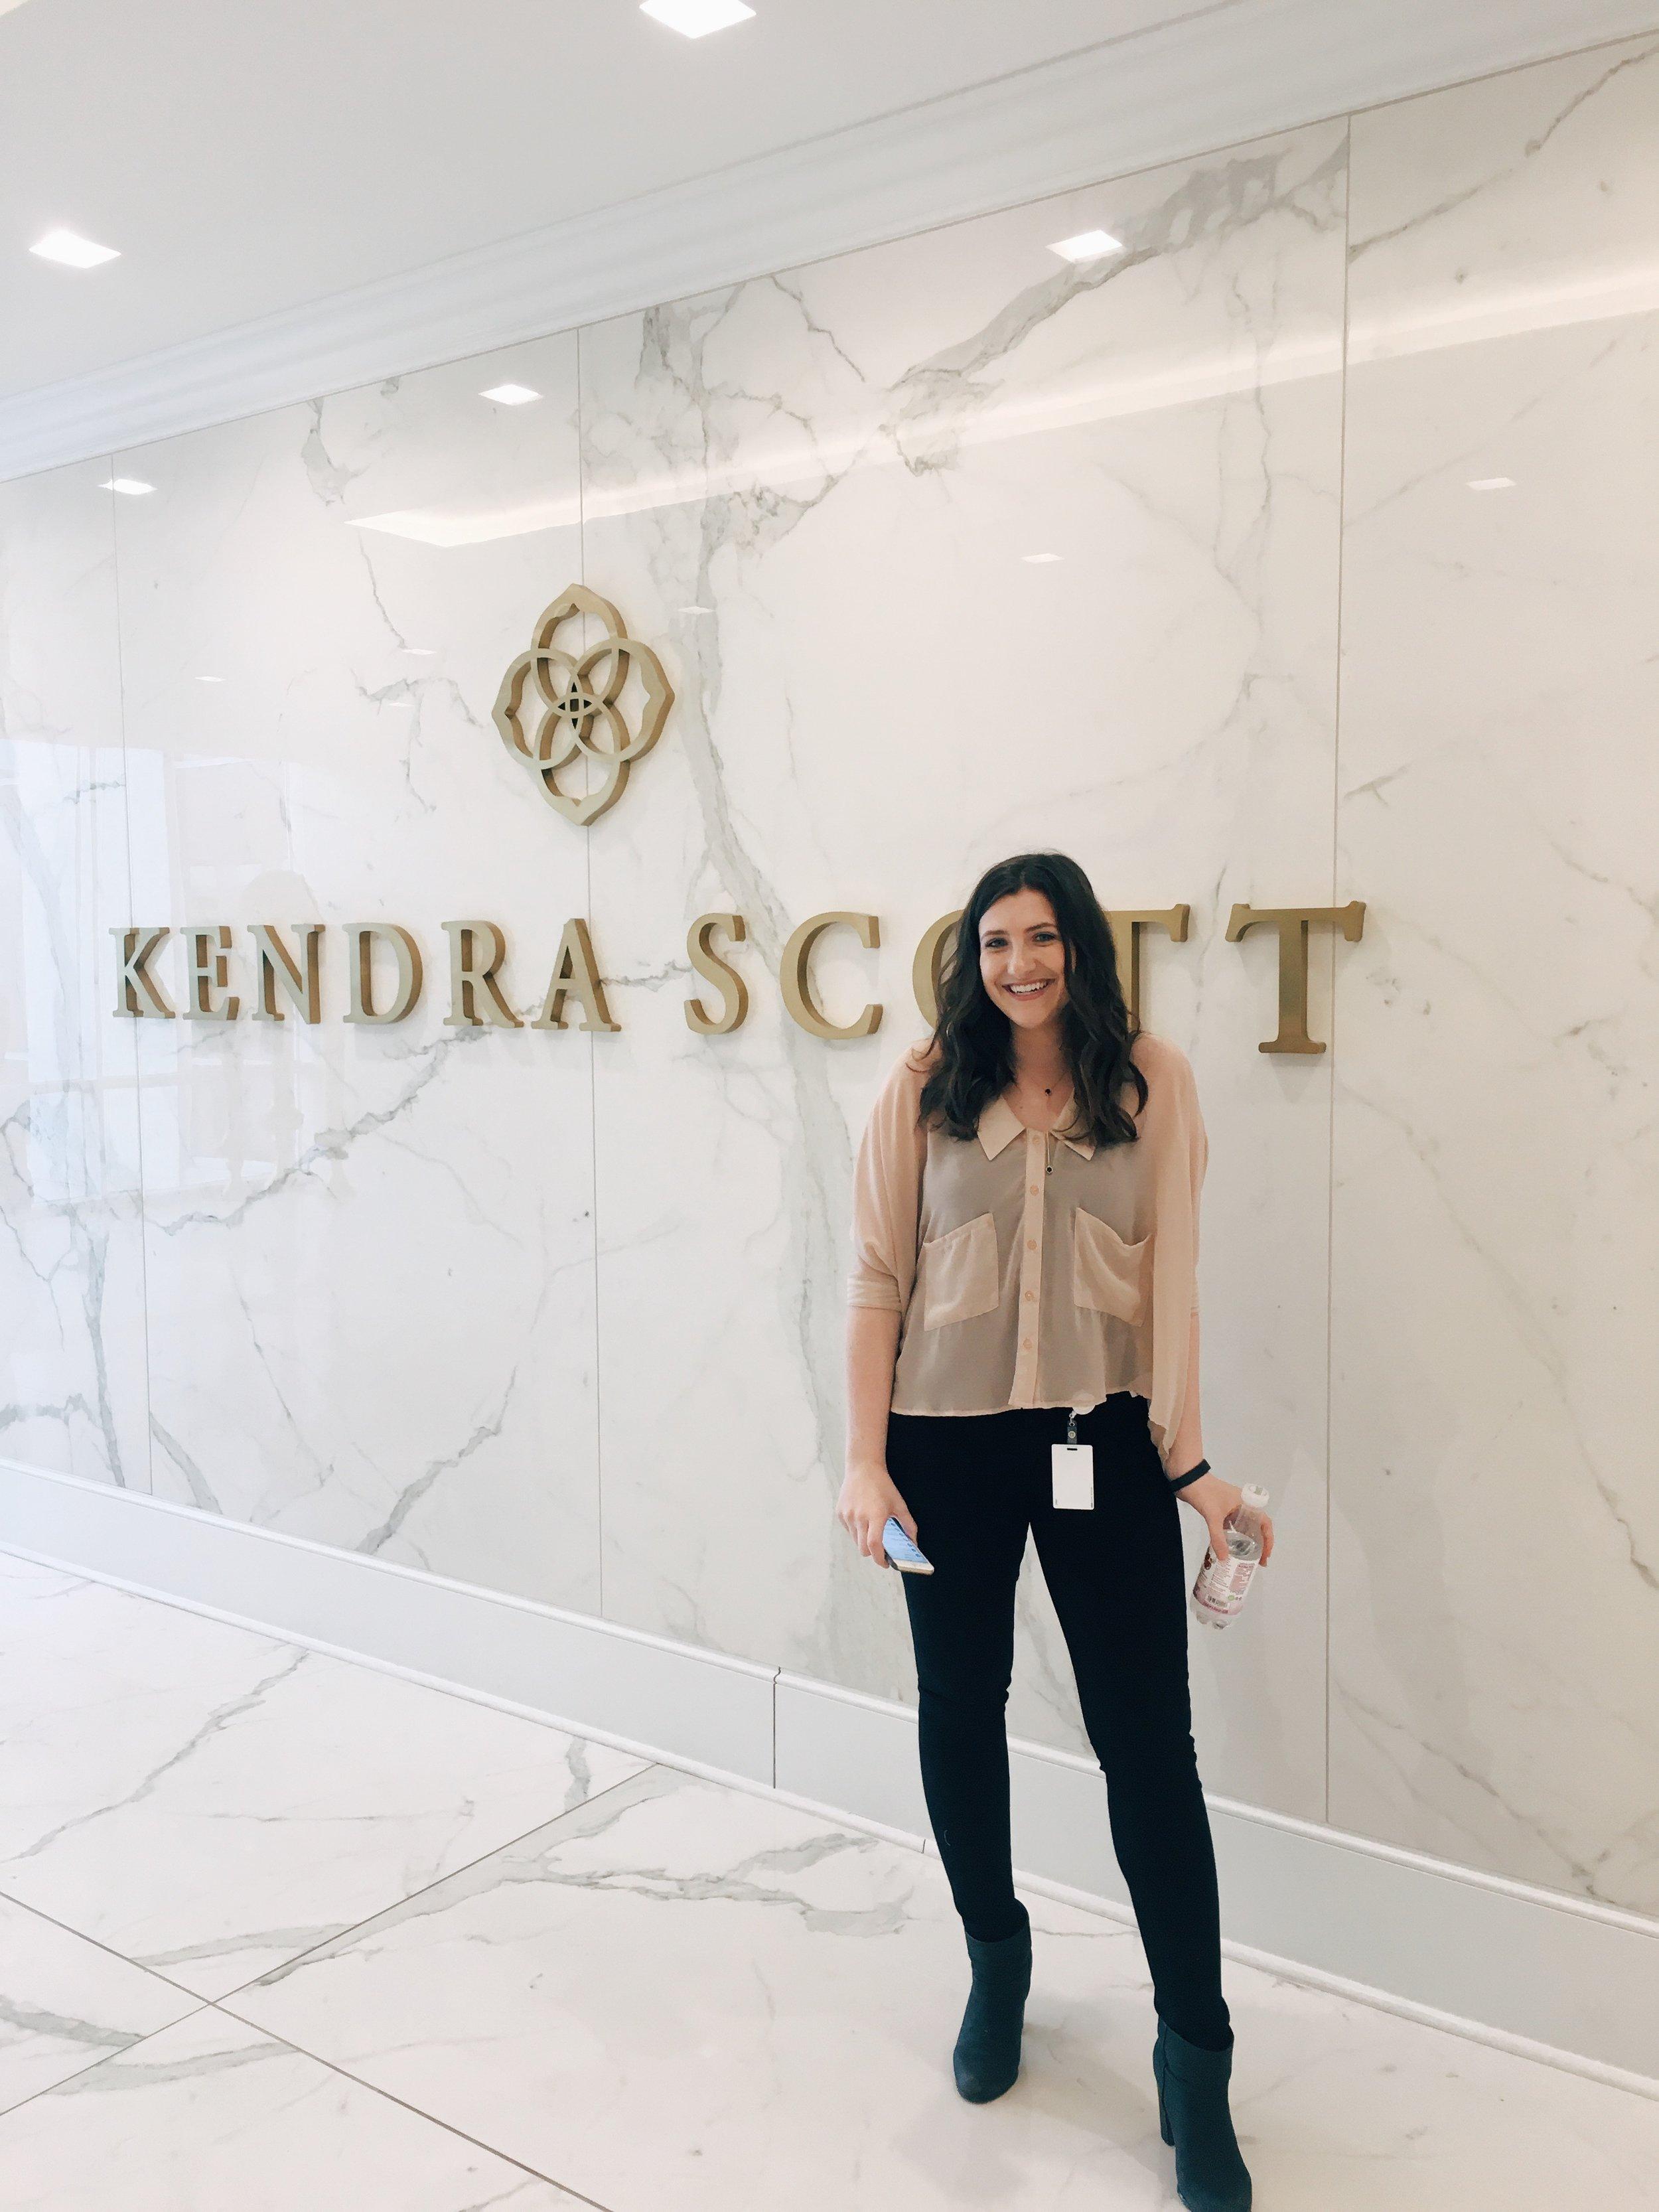 kendra-scott-corporate-office.JPG